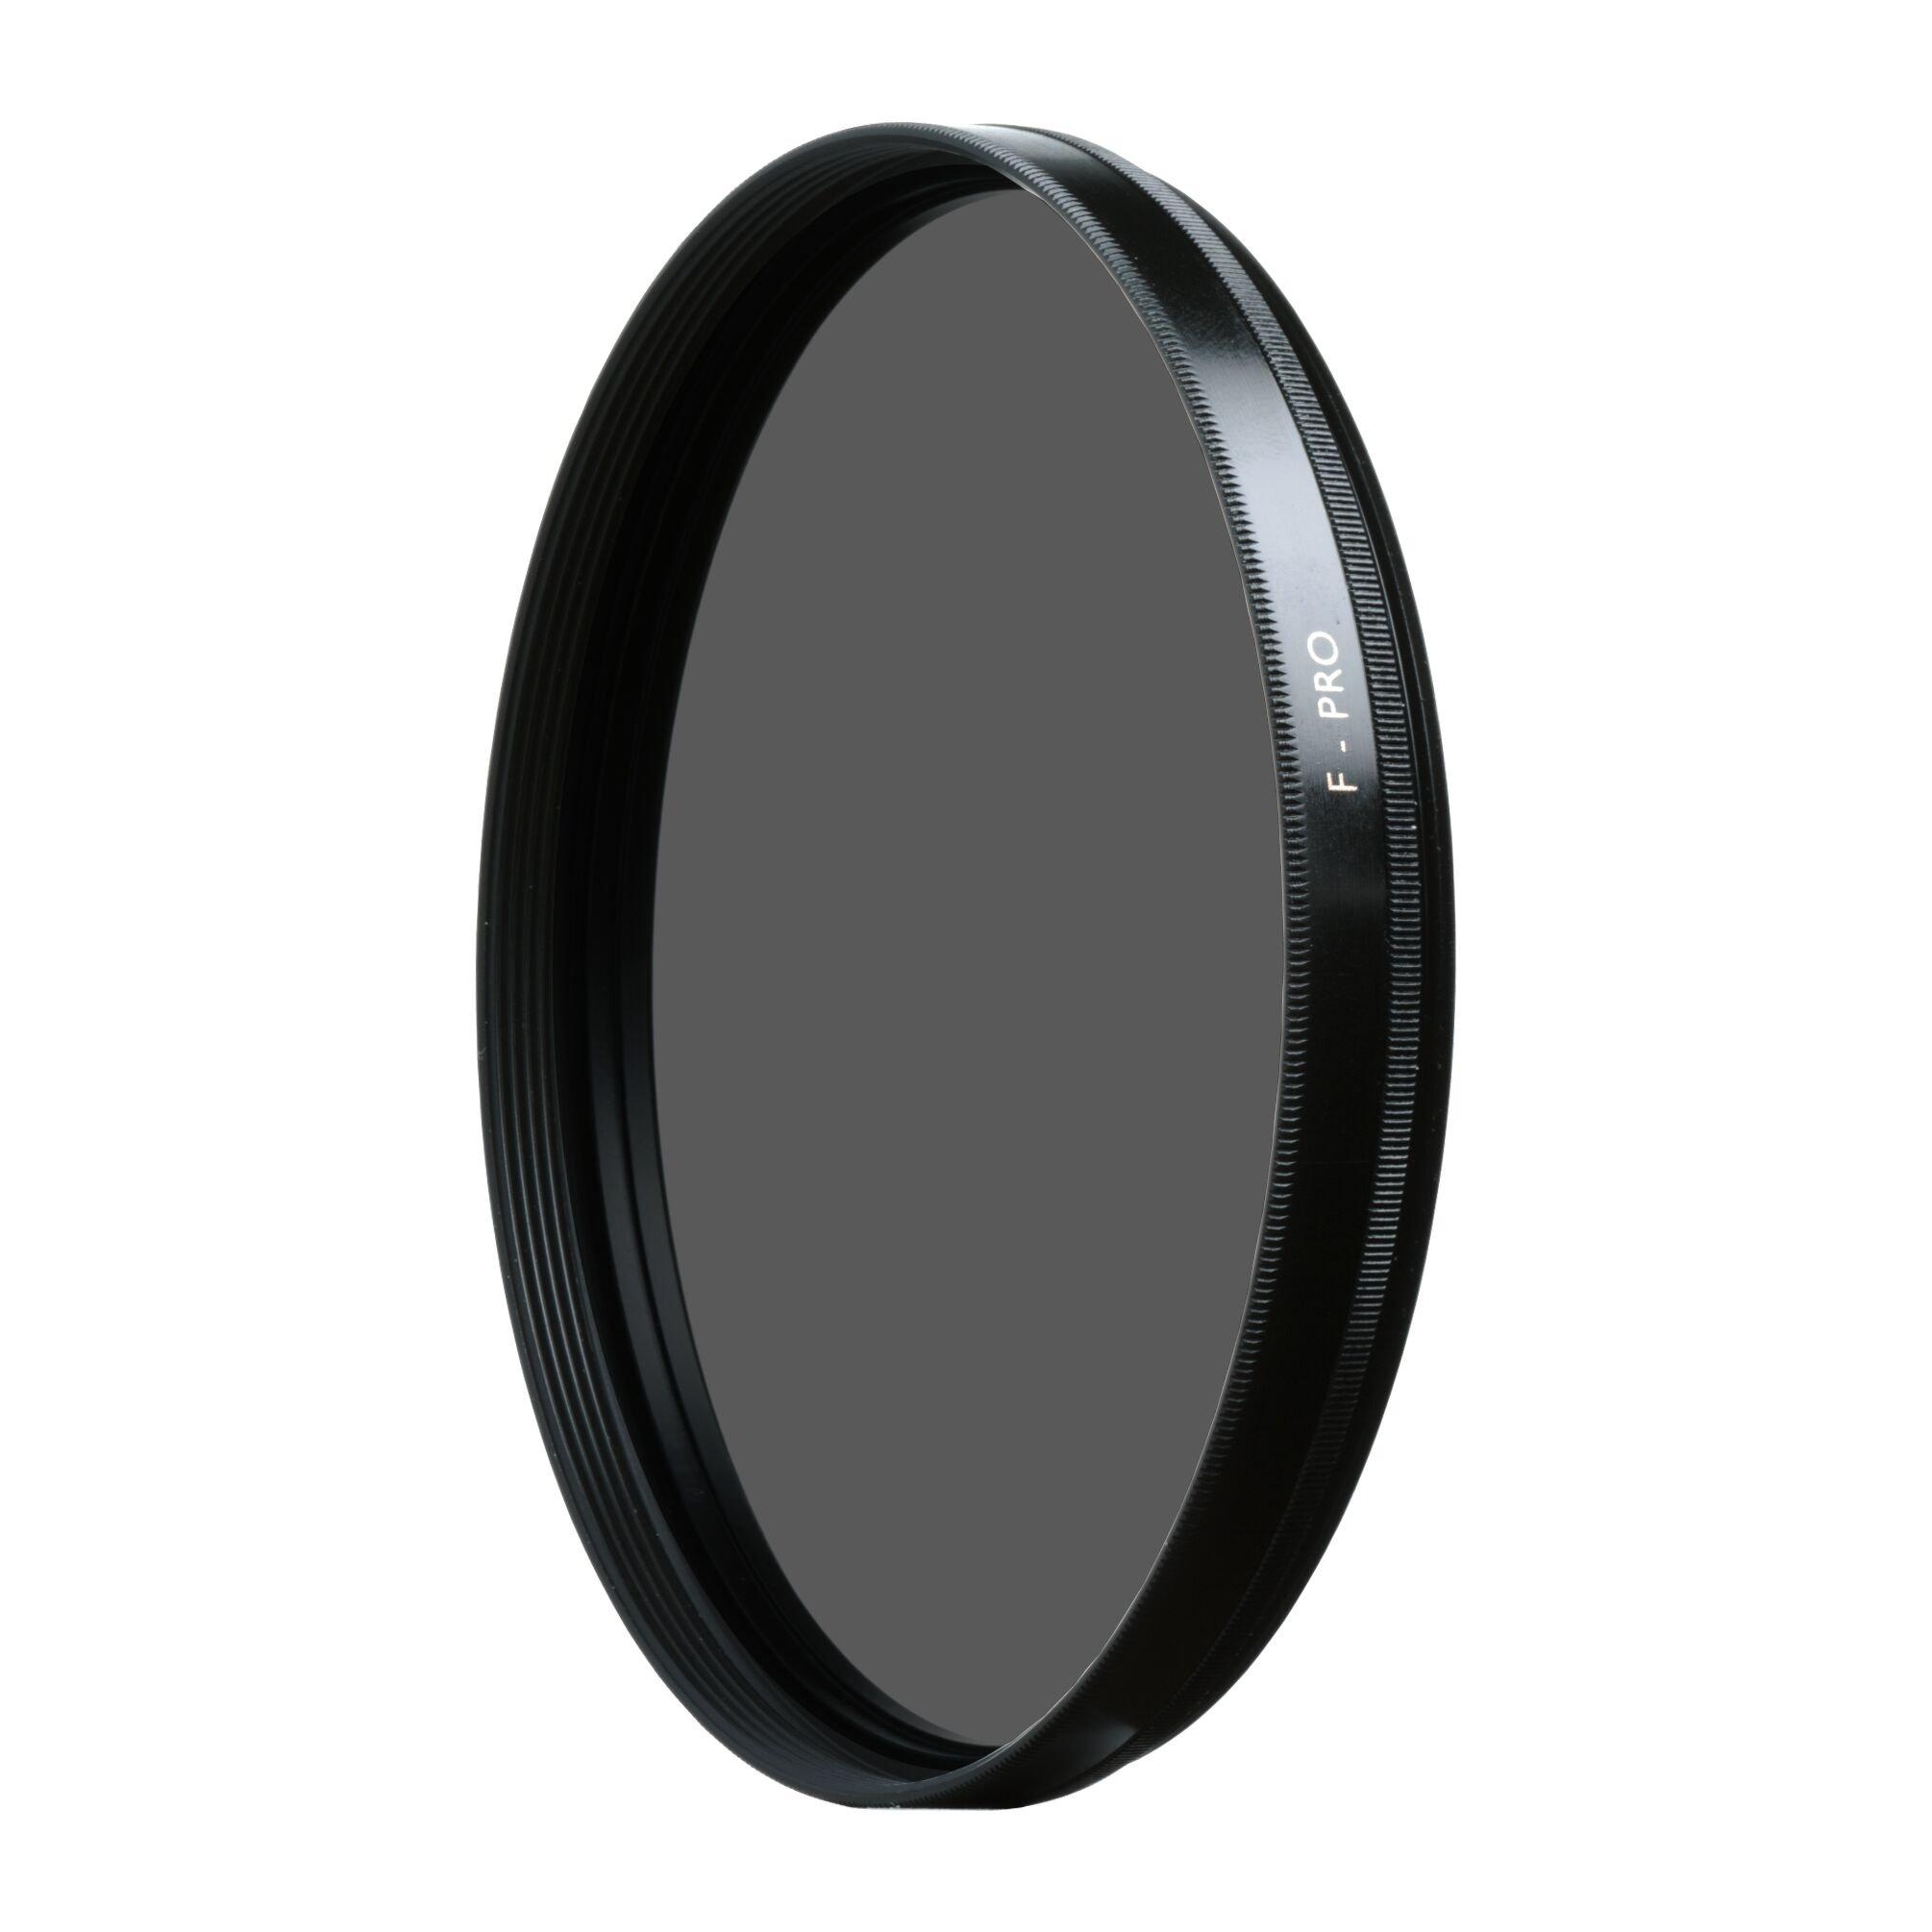 B+W 60mm Kaesemann Circular Polarizer with Multi-Resistant Coating